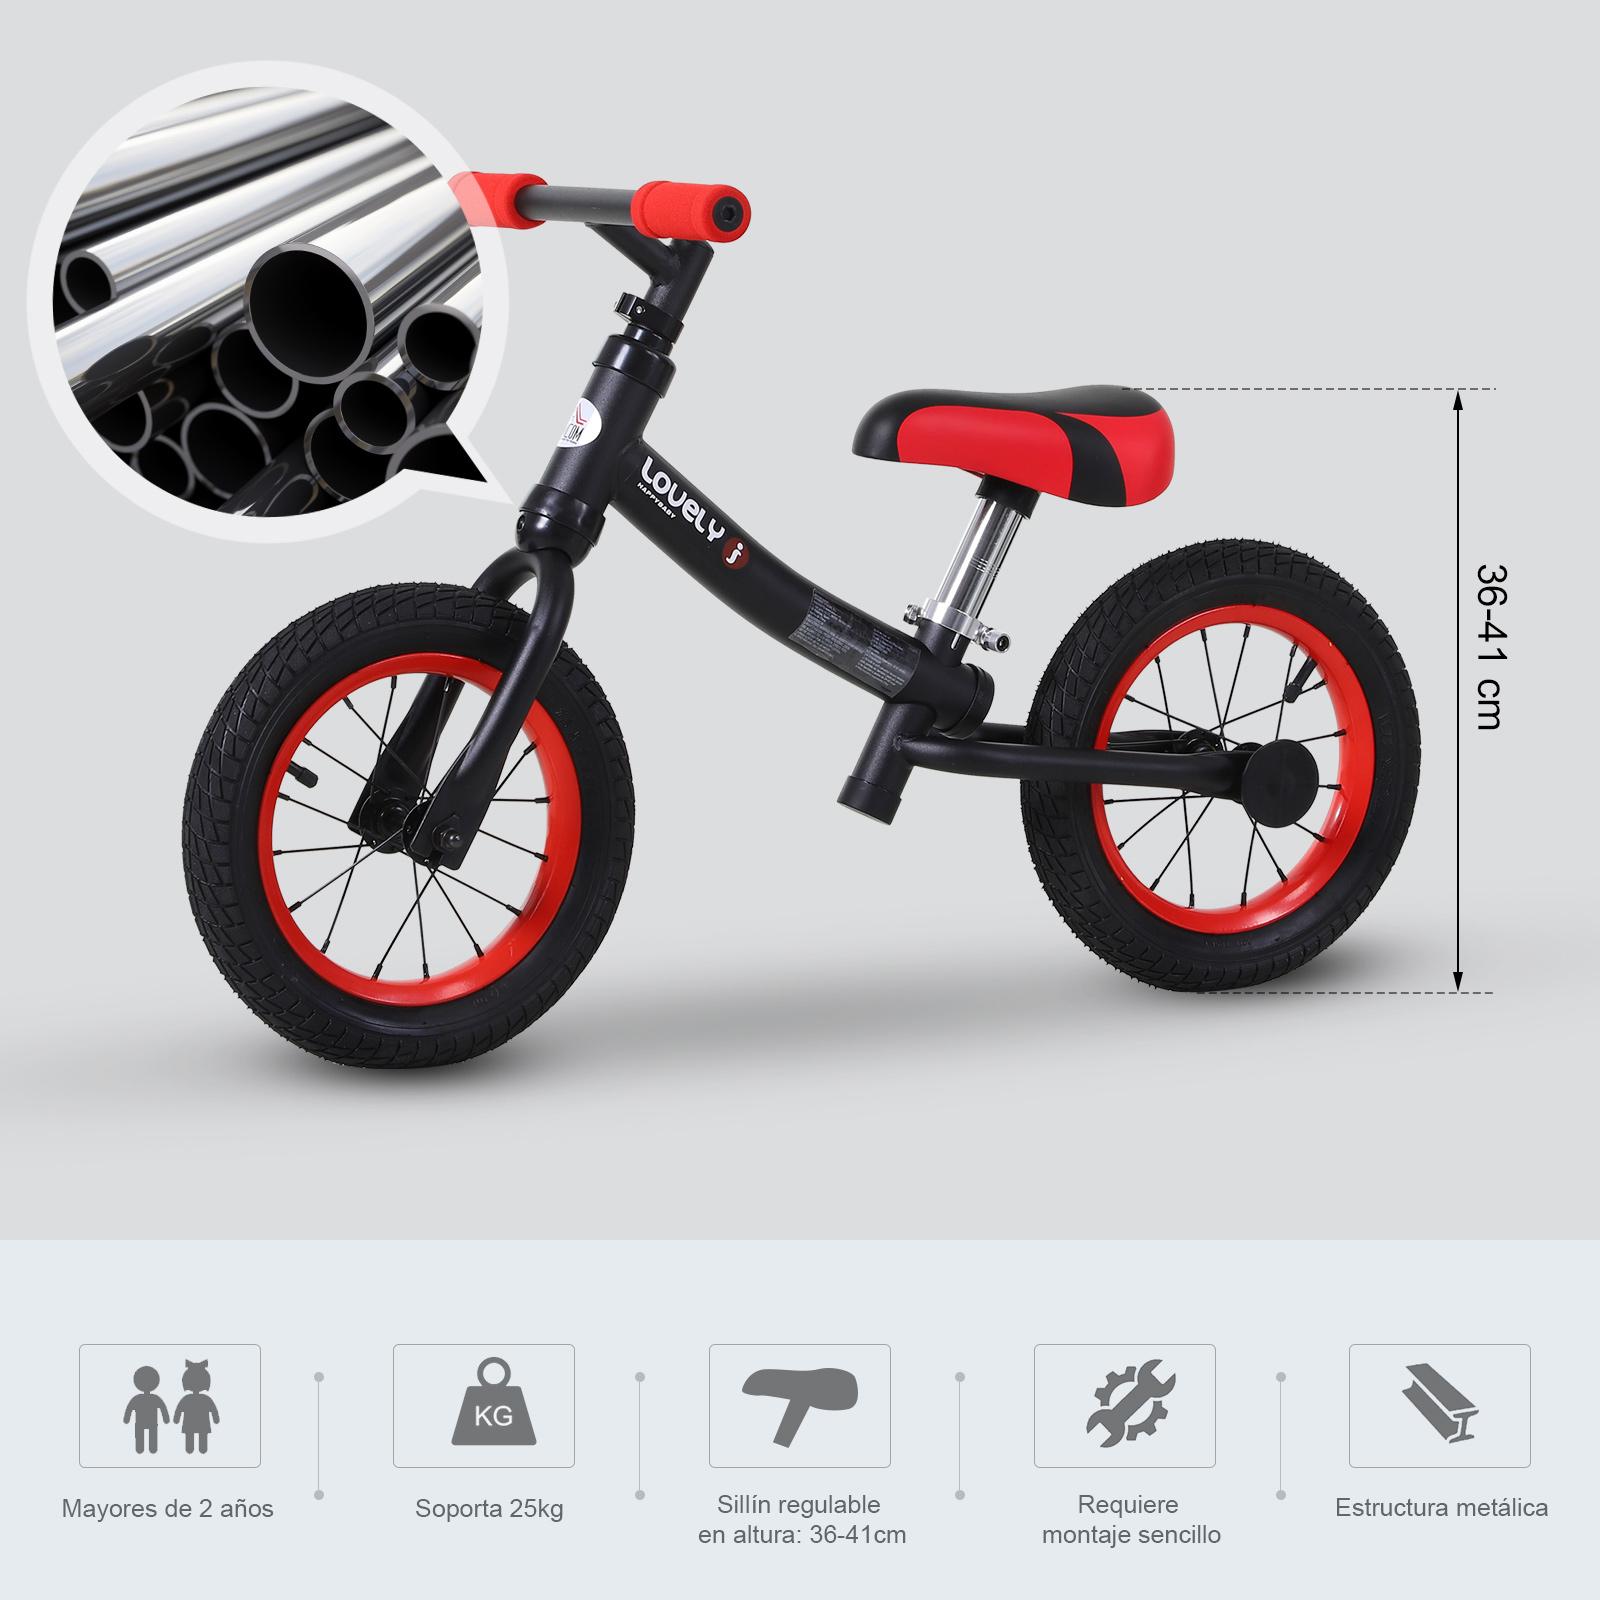 Bicicleta-sin-Pedales-de-Altura-de-Asiento-Regulable-31-45cm-2-5-Anos miniatura 6